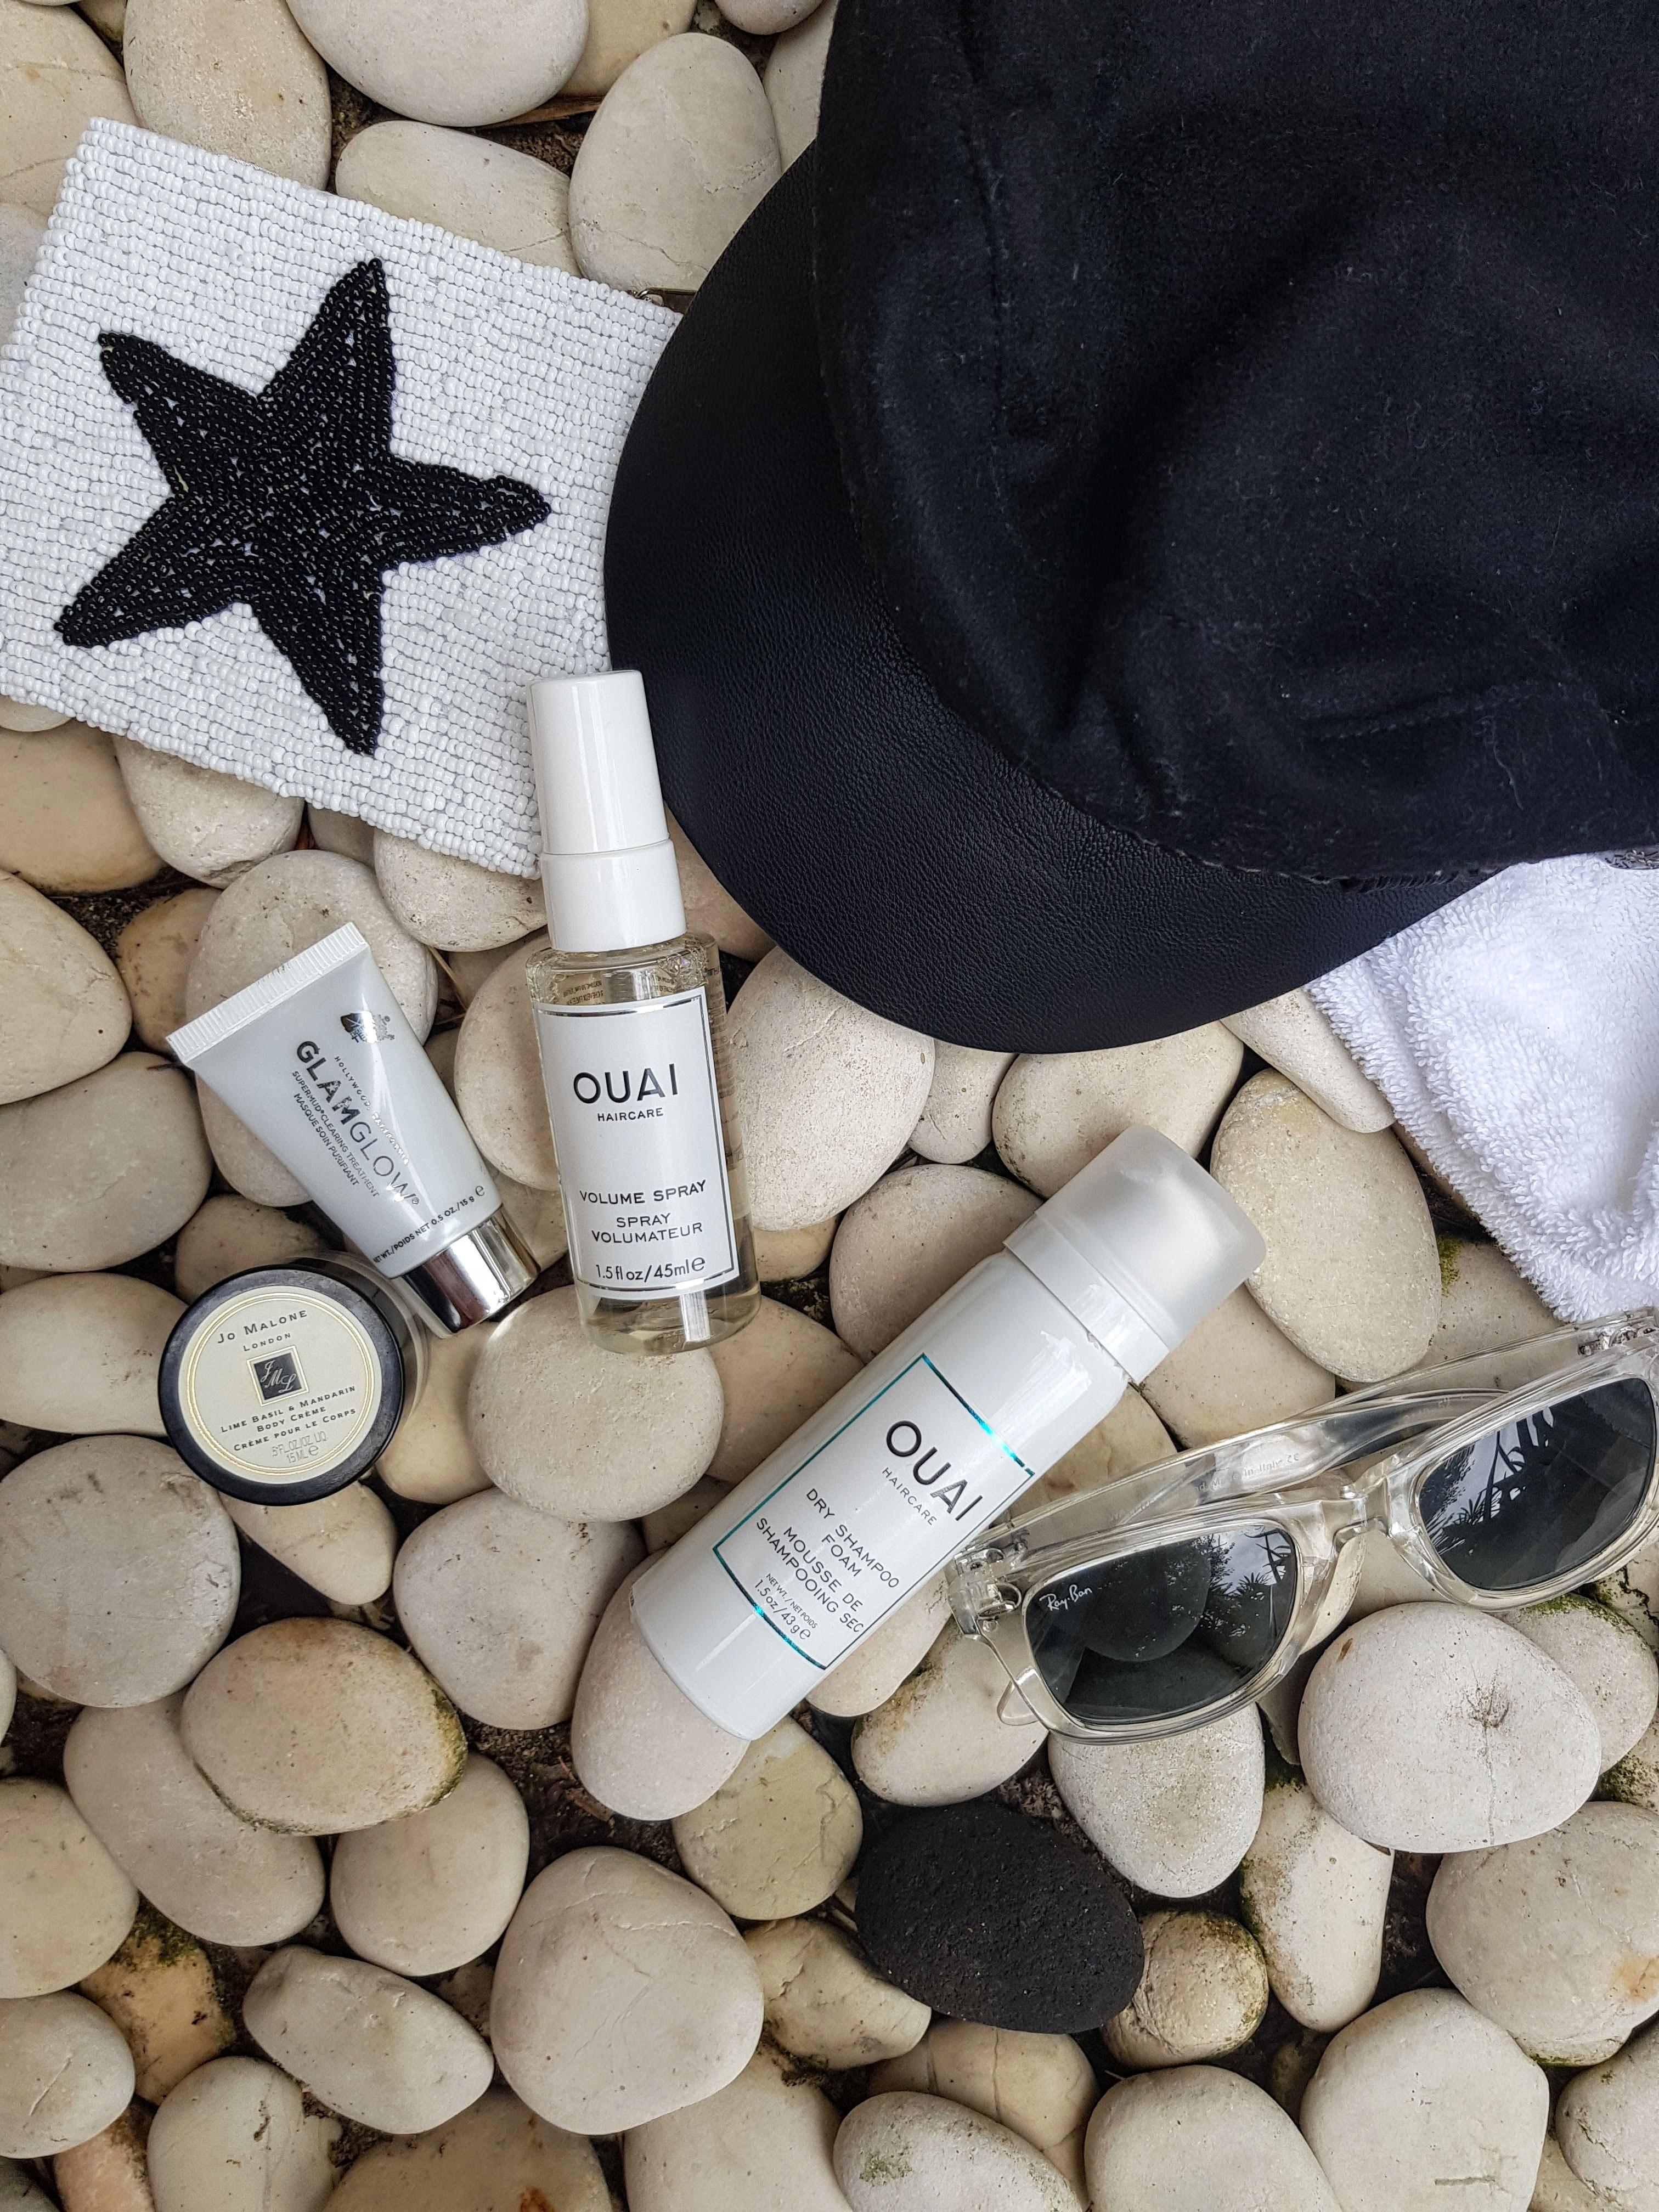 bali beauty heat survival guide essential makeup skincare travel blog vlog hair